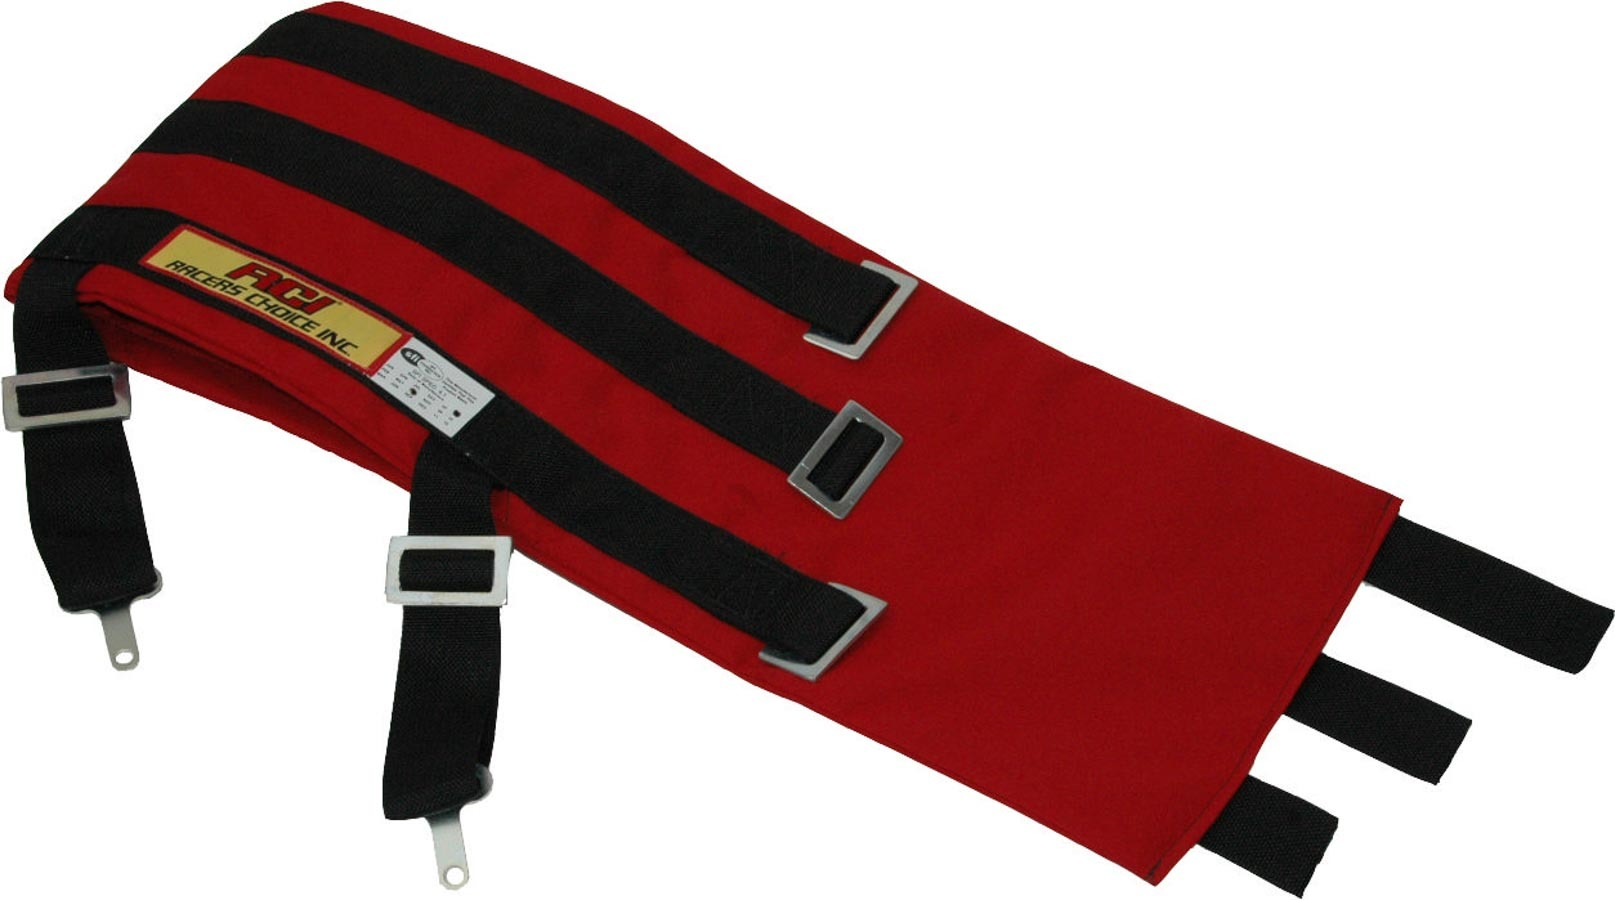 Rci Transmission Blanket Universal SFI 4.1 Red